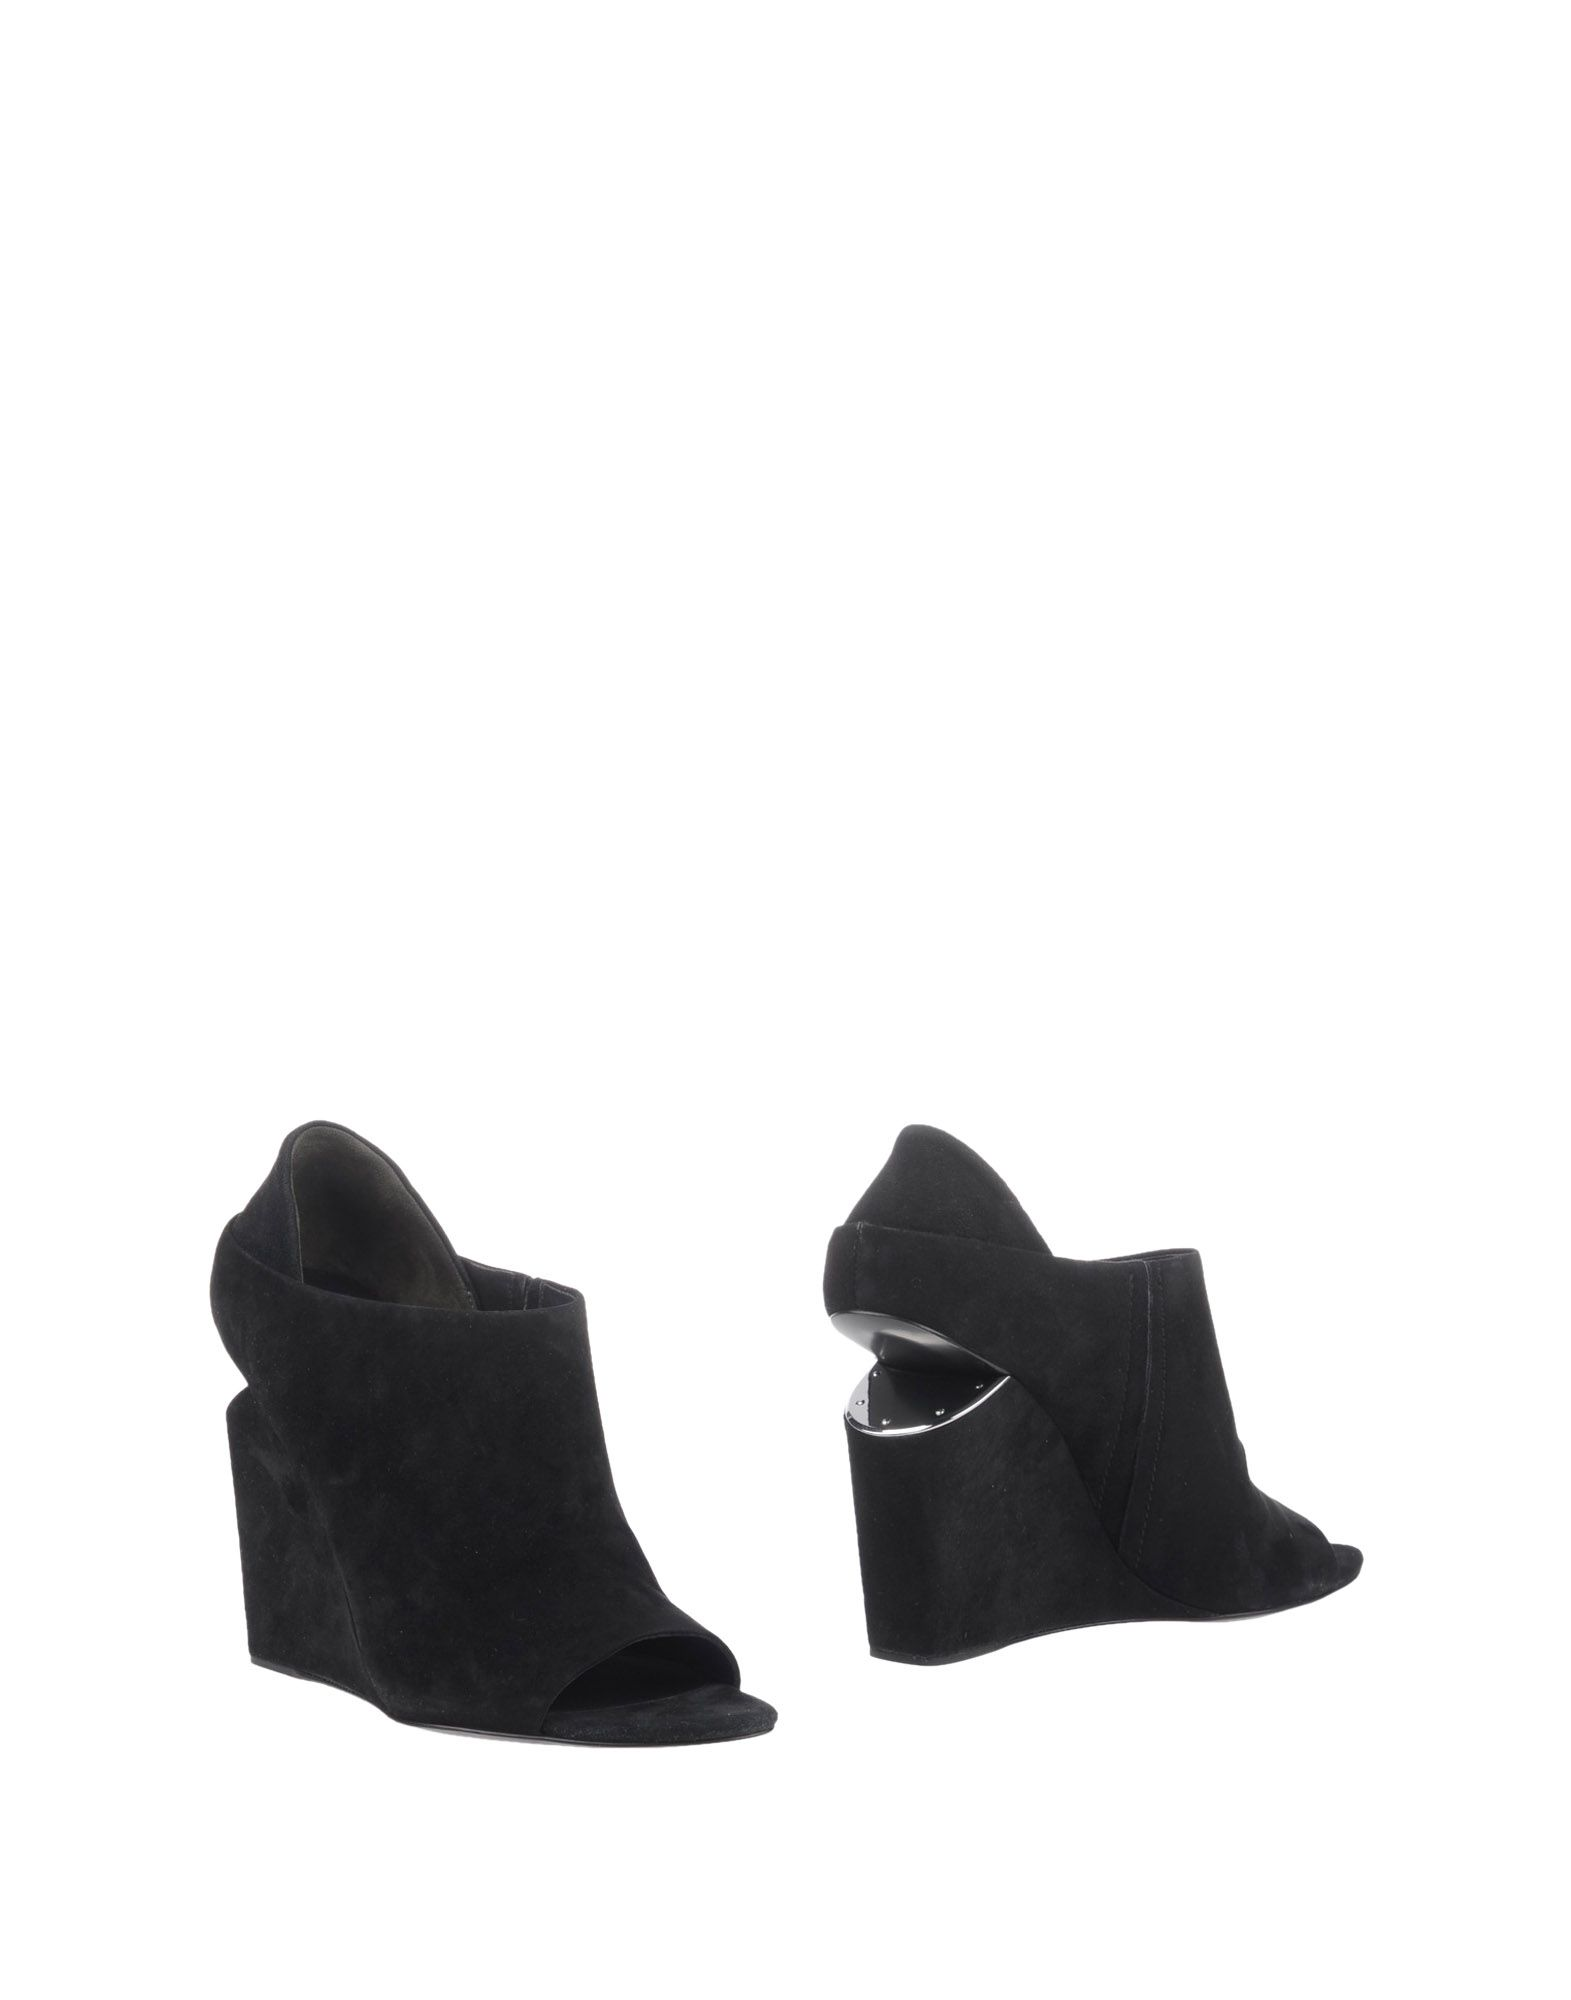 Alexander Wang Stiefelette Damen  11203972PCGut aussehende strapazierfähige Schuhe